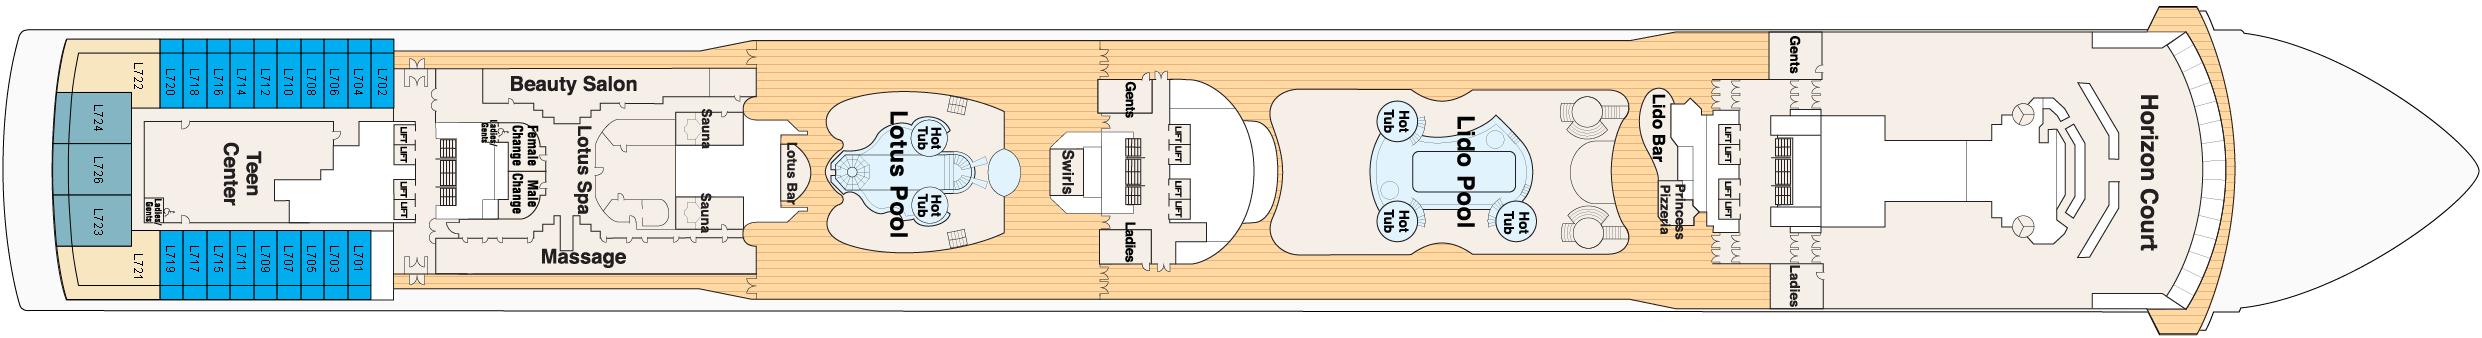 Deck 14 – Lido